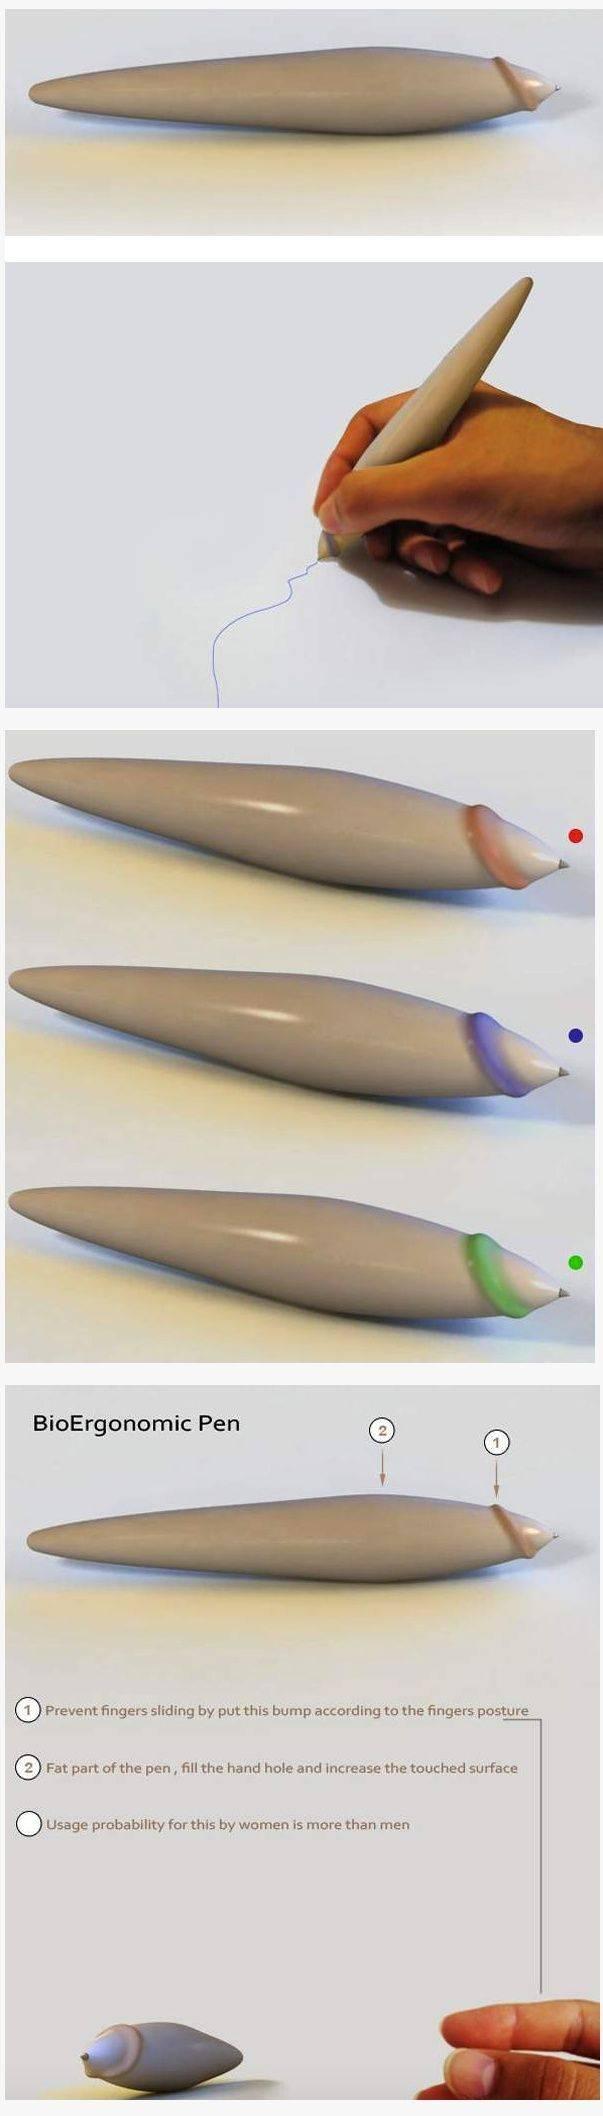 stock_new1-4166862-original-000.jpg : 인체공학적으로 설계된 펜